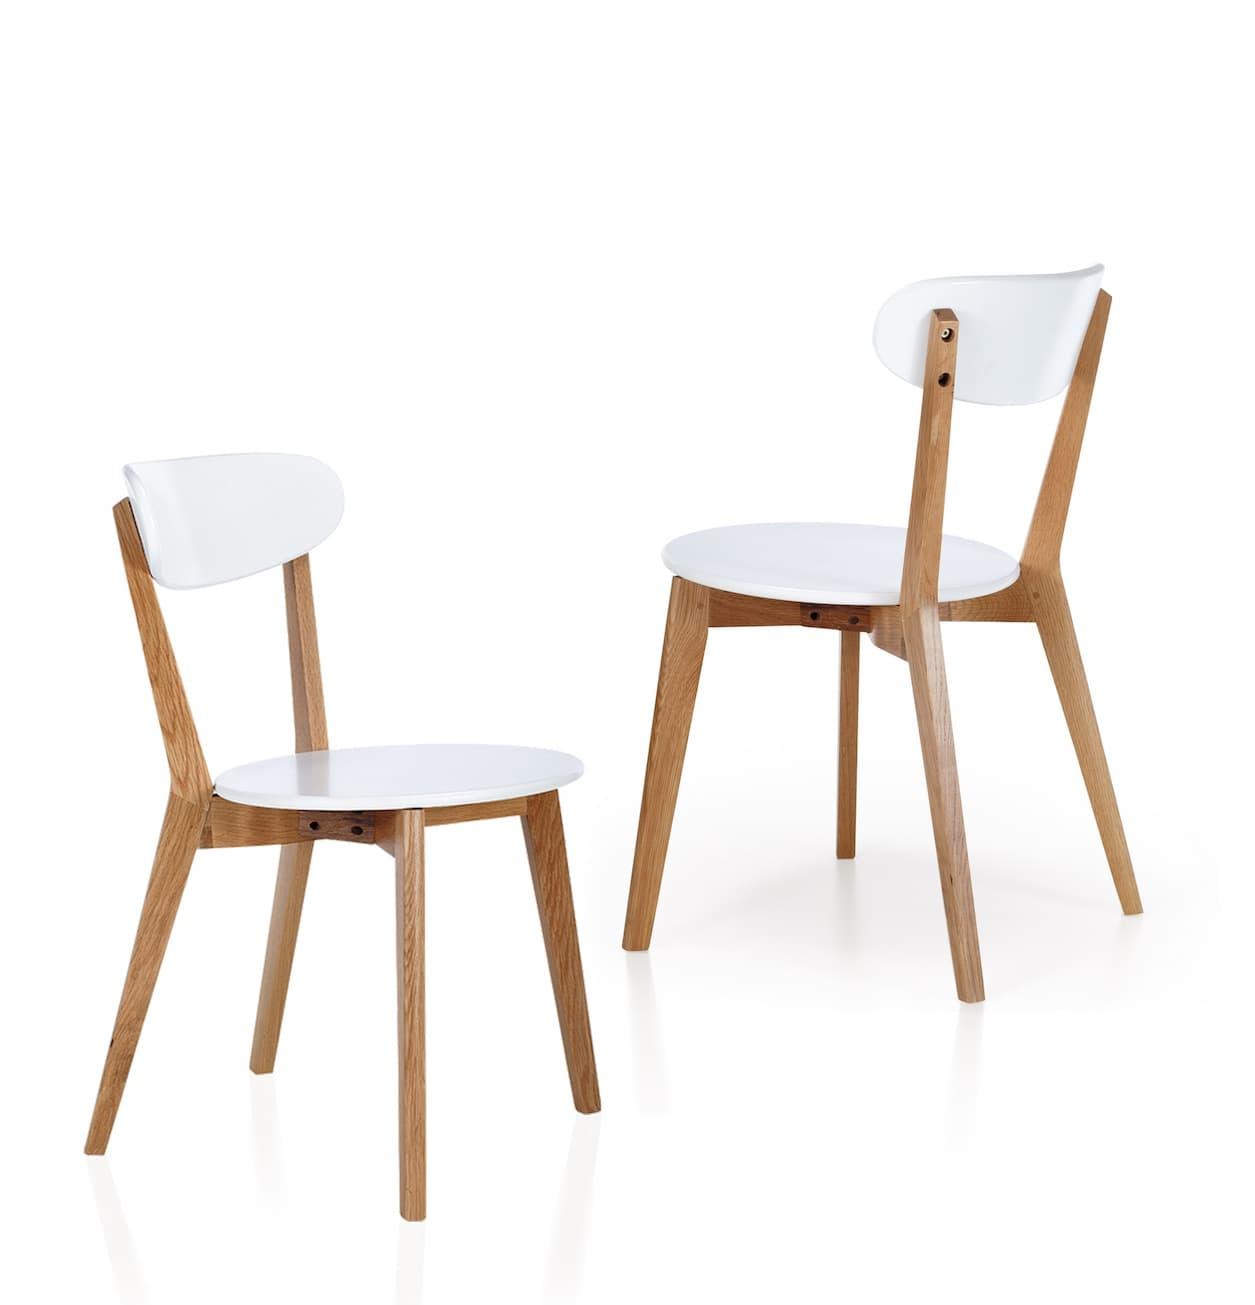 Siege salle a manger 30 l gant chaise pliante salle for Siege salle a manger